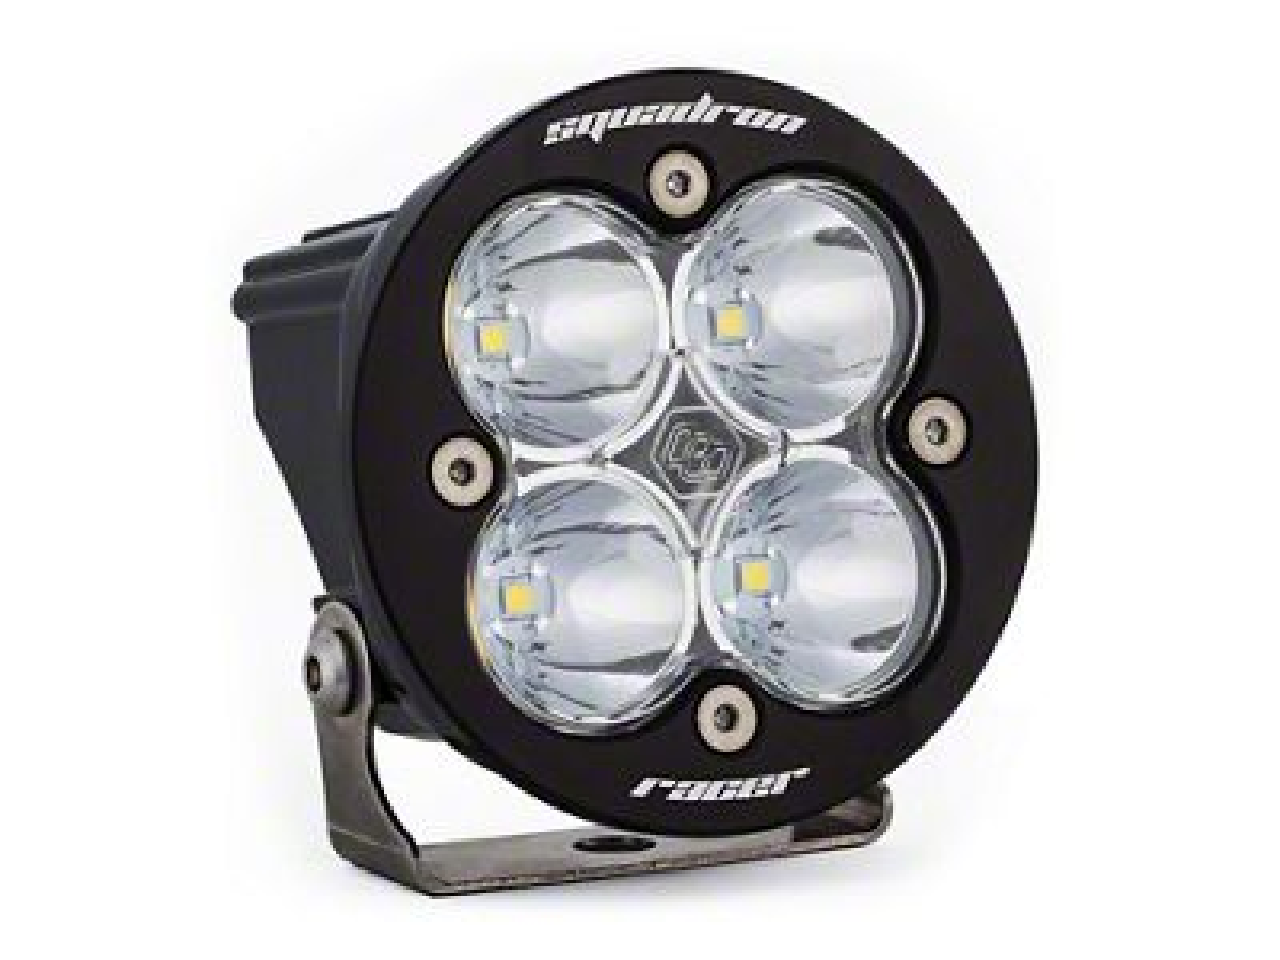 Baja Designs Squadron-R Racer Edition LED Light - Spot Beam